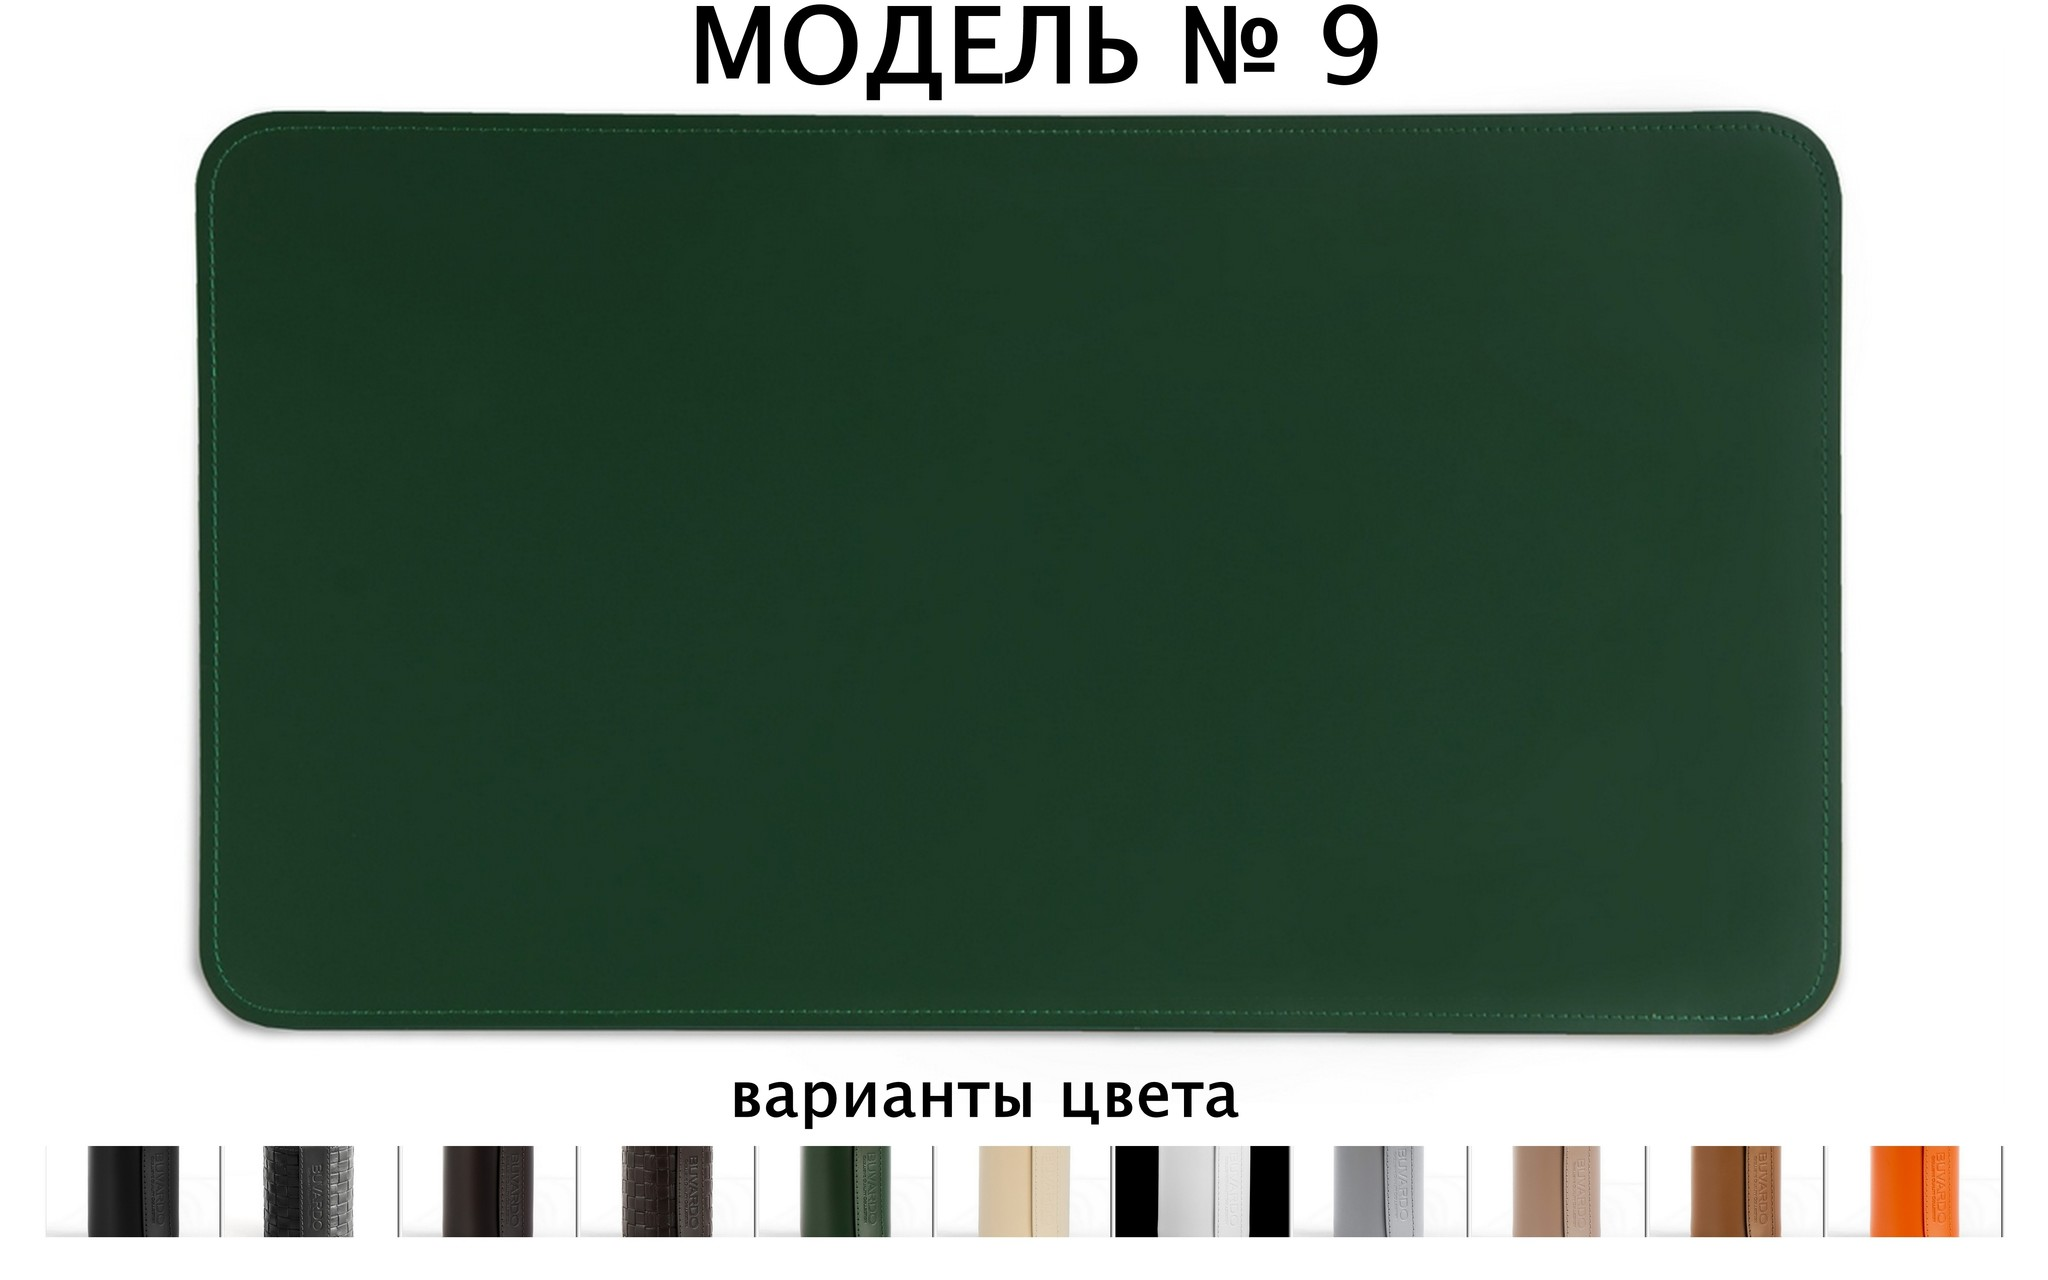 Бювар модель 9 серии Стандарт в вариантах цвета кожи Cuoietto.